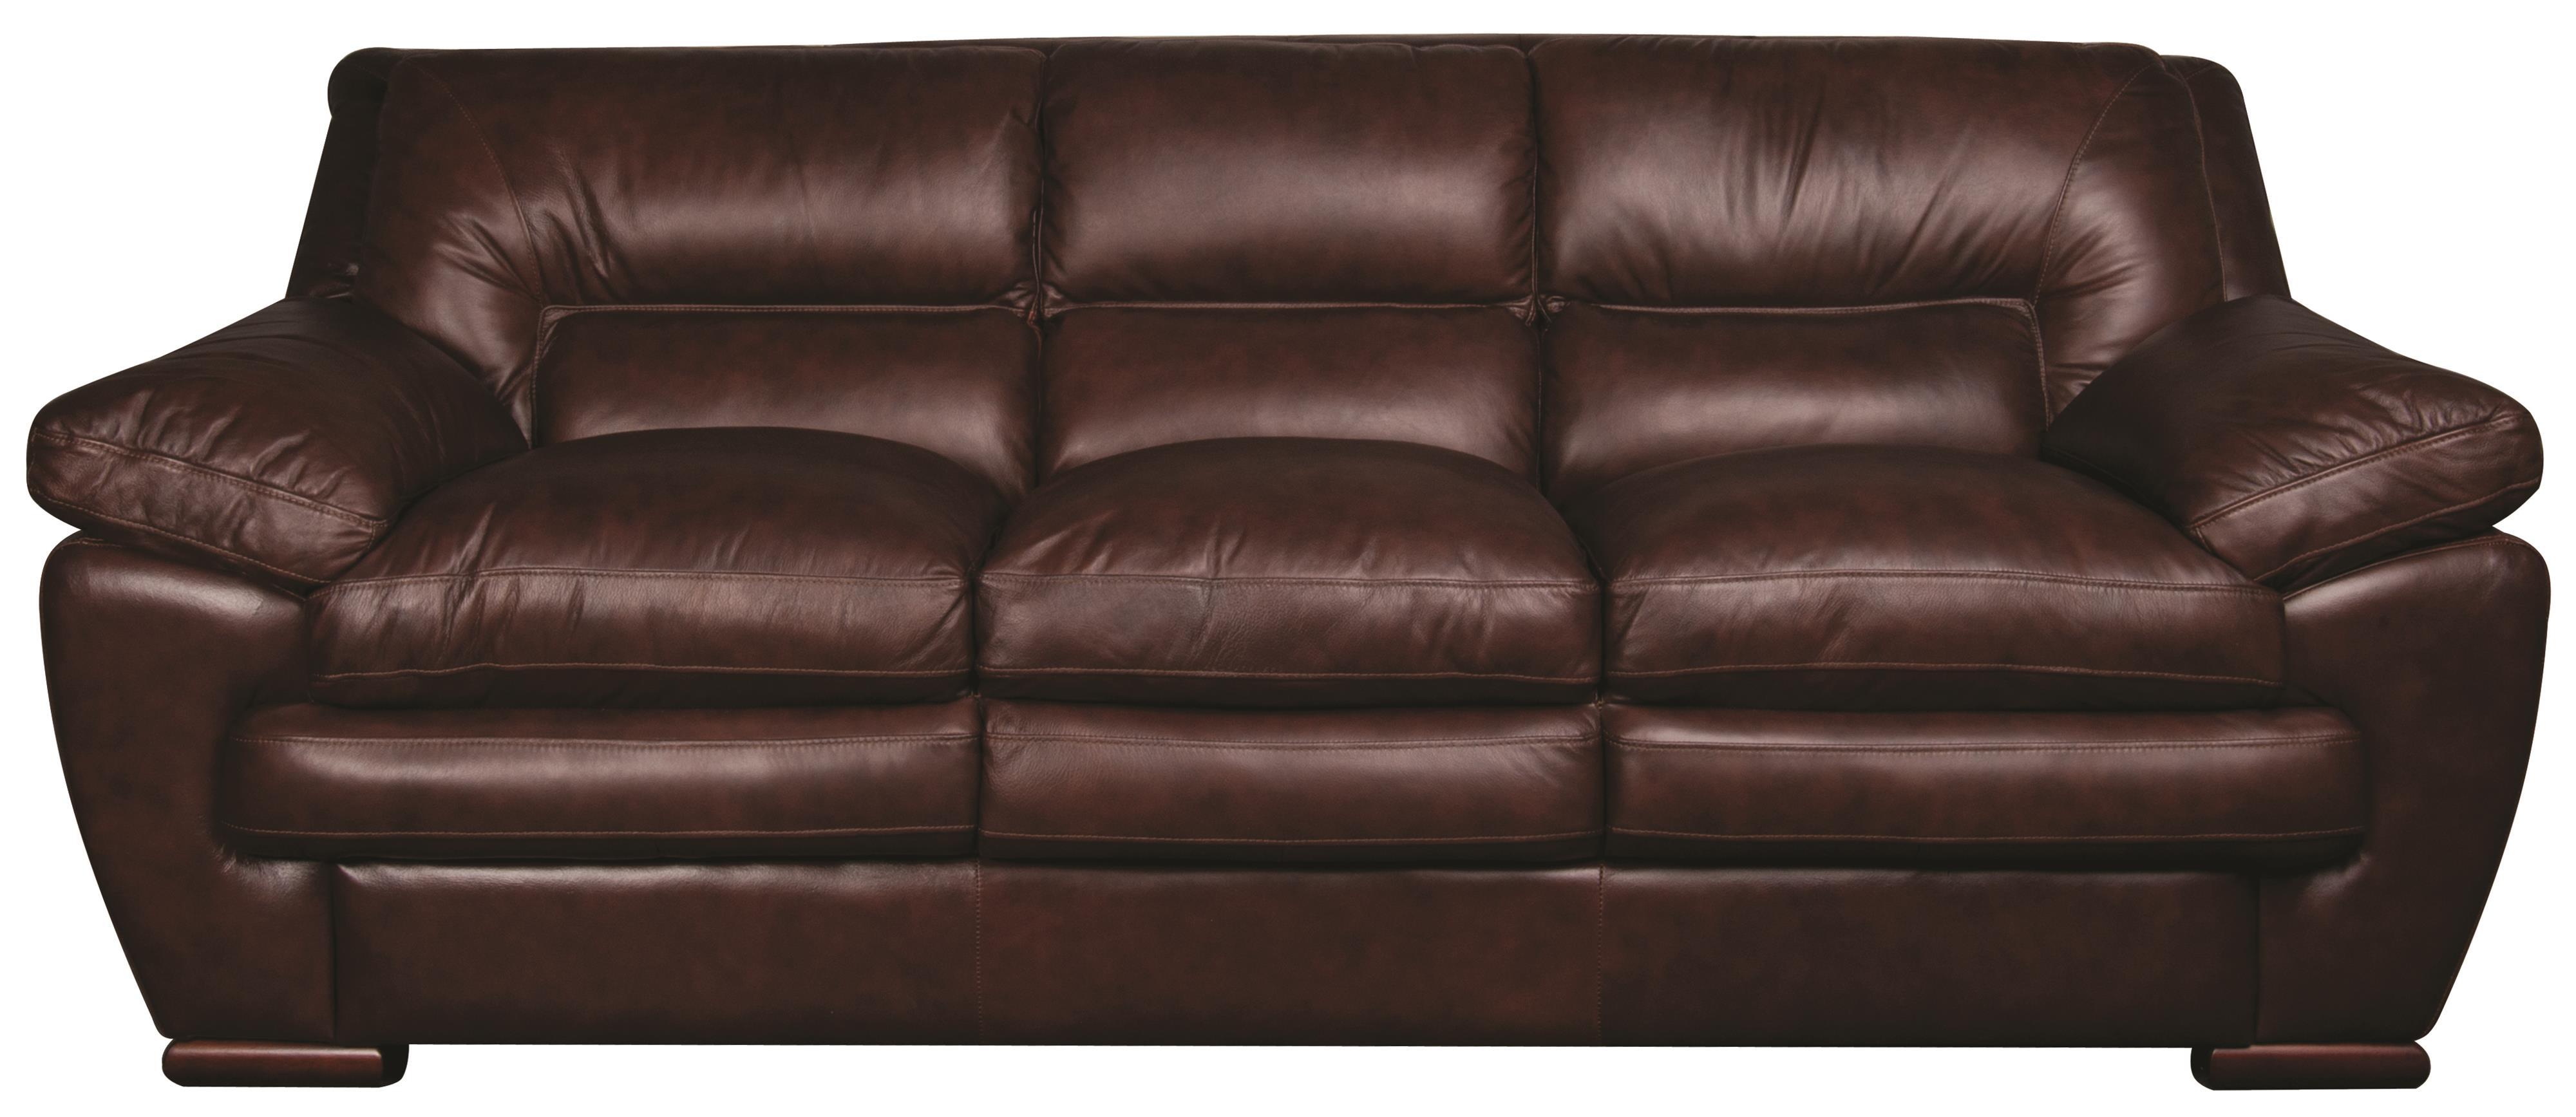 Leather Sofa Columbus Ohio Wwwstkittsvillacom